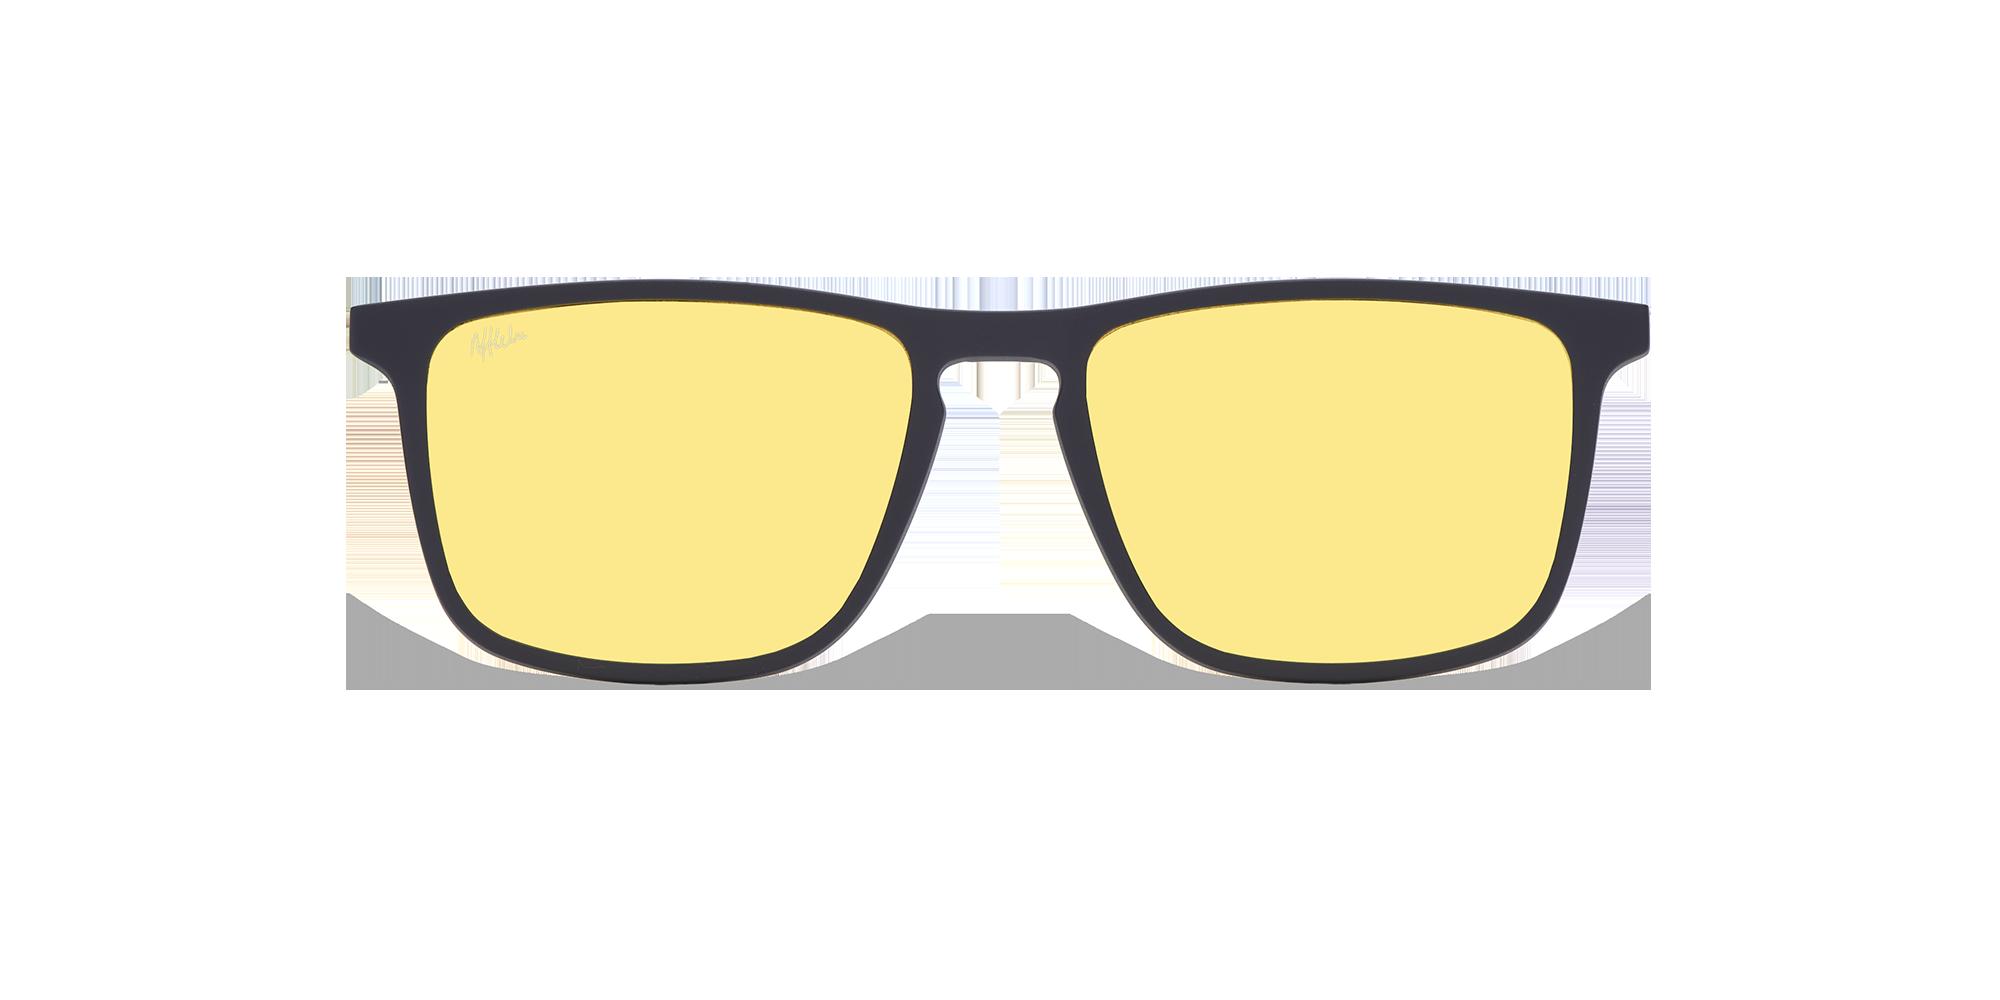 afflelou/france/products/smart_clip/clips_glasses/07630036428832_face.png